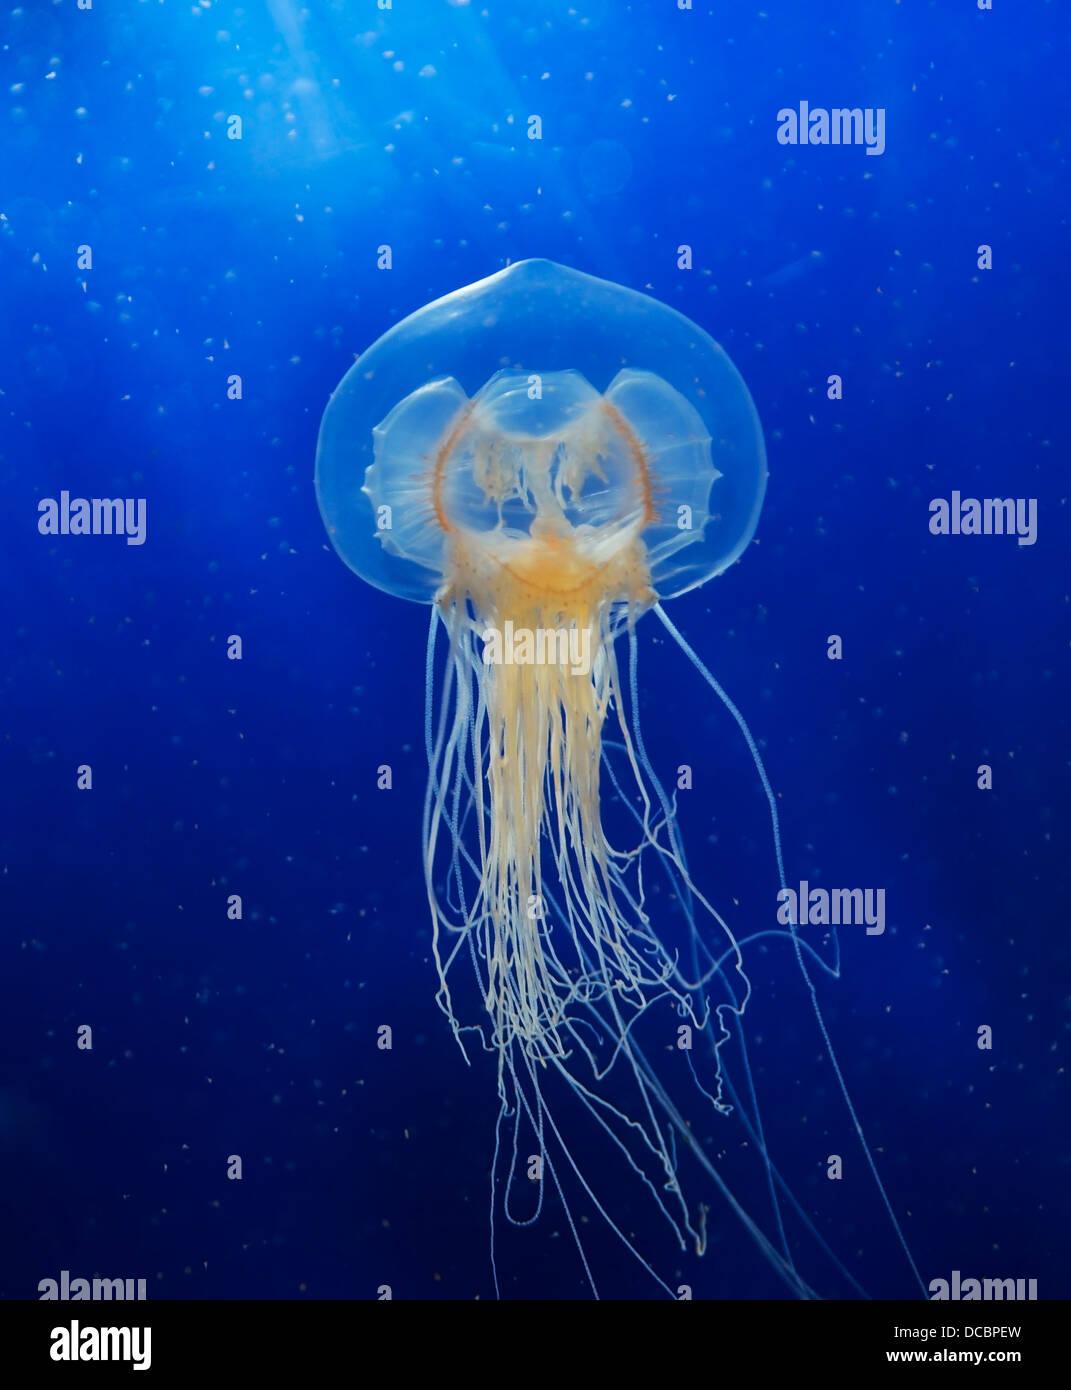 Swimming Jellyfish On Blue Background - Stock Image